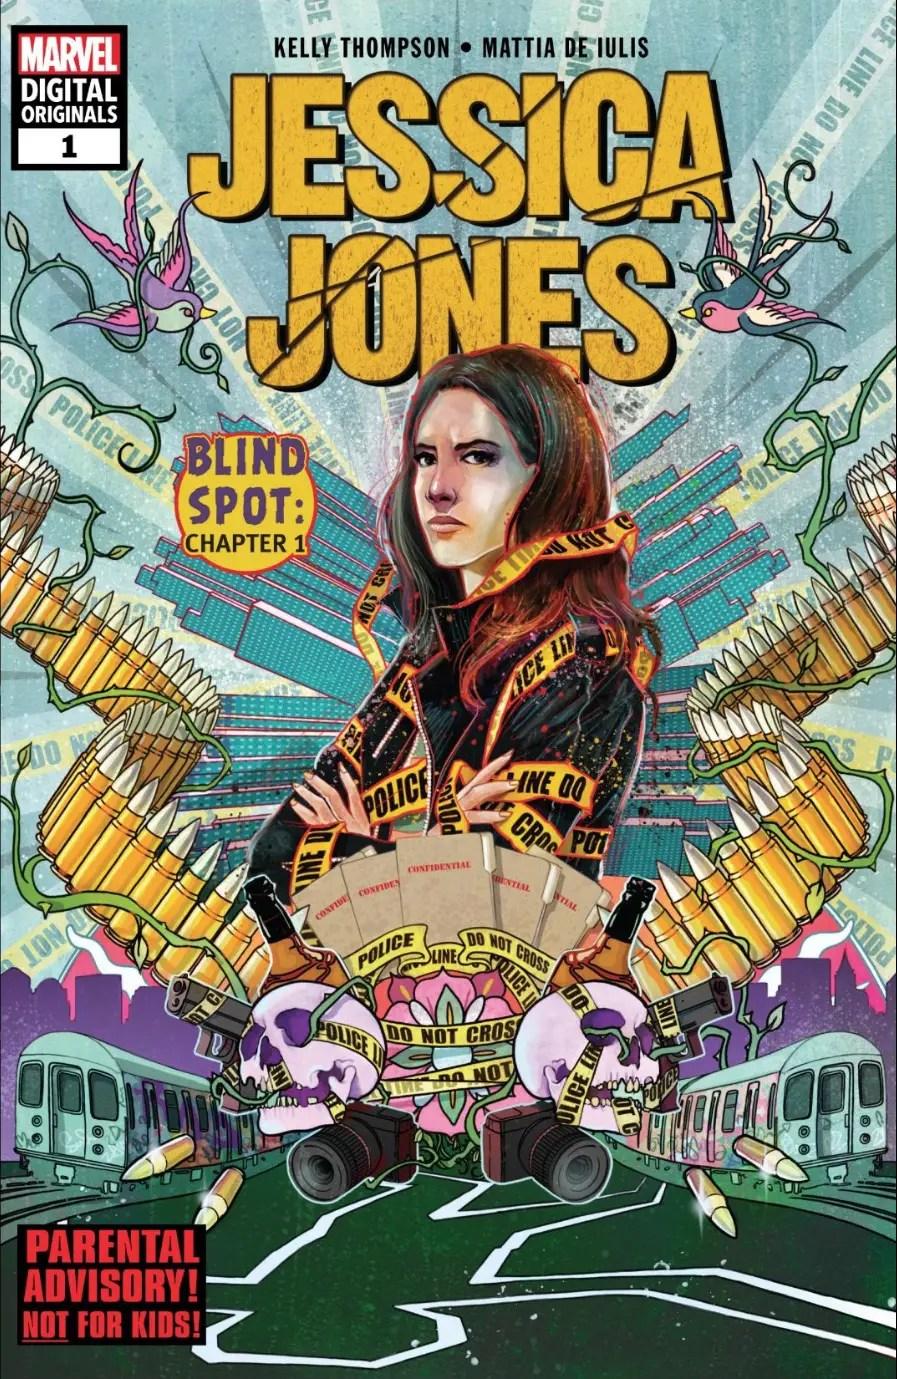 Jessica Jones #1 (Marvel Digital Originals) review: Jessica's in good hands with this new creative team